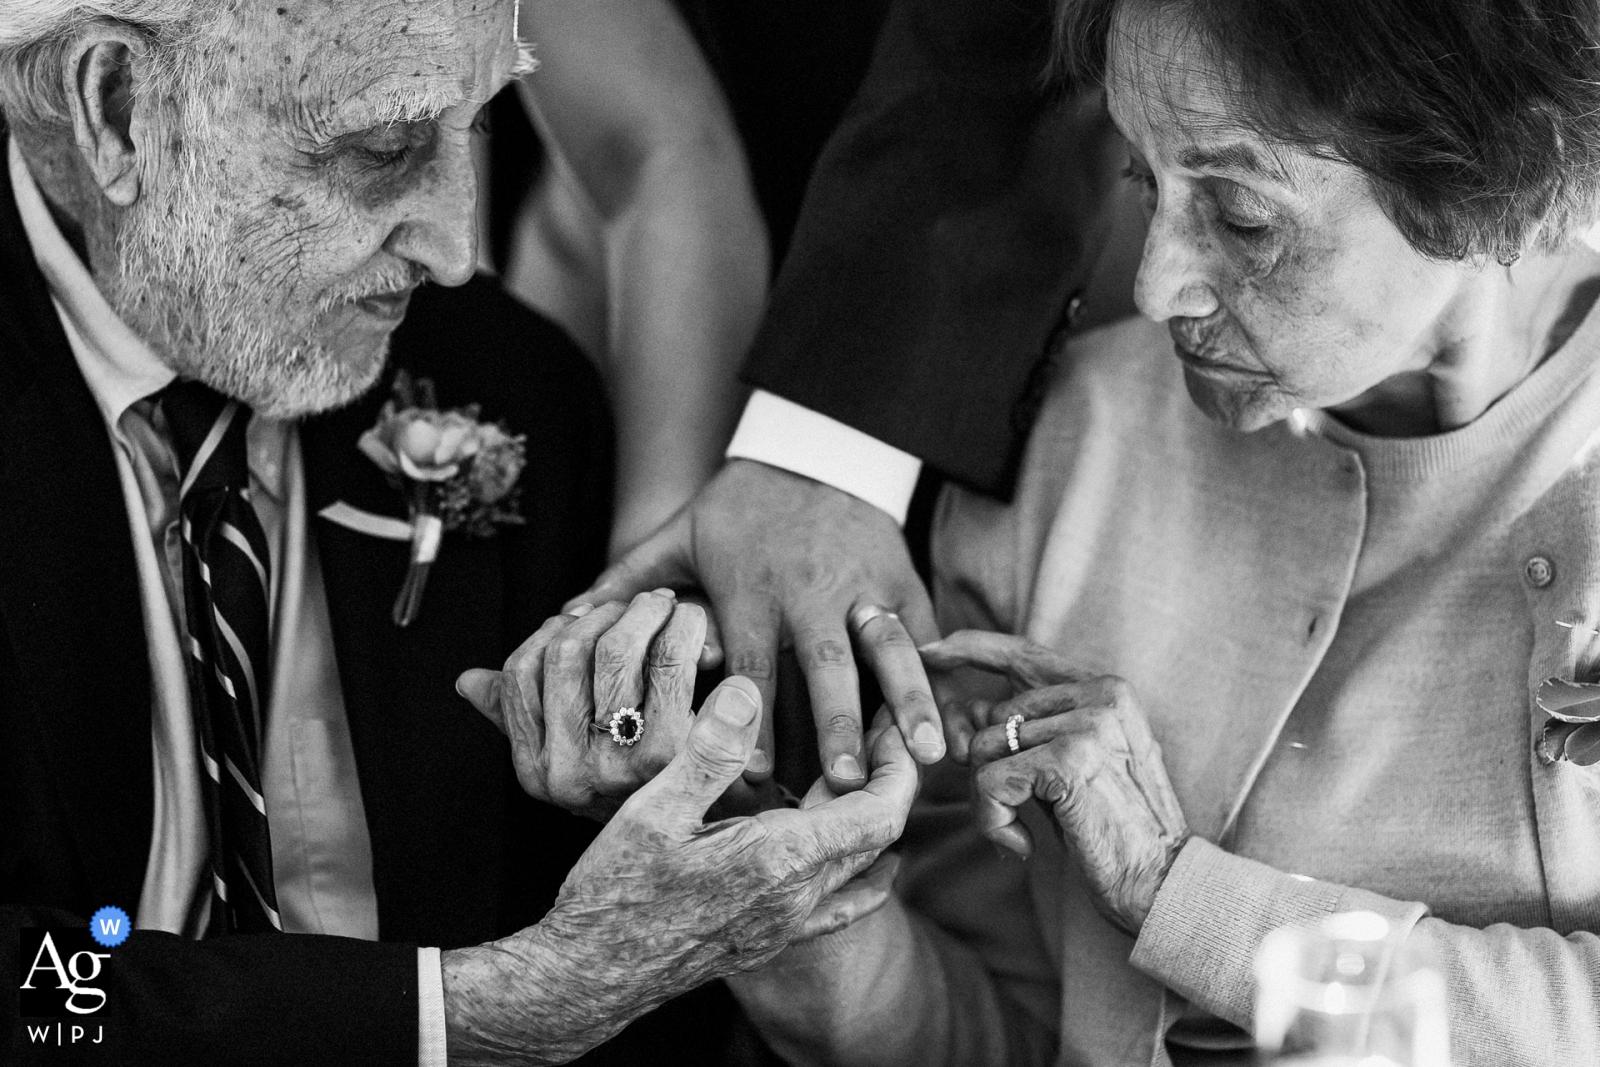 Chris Shum is an artistic wedding photographer for California